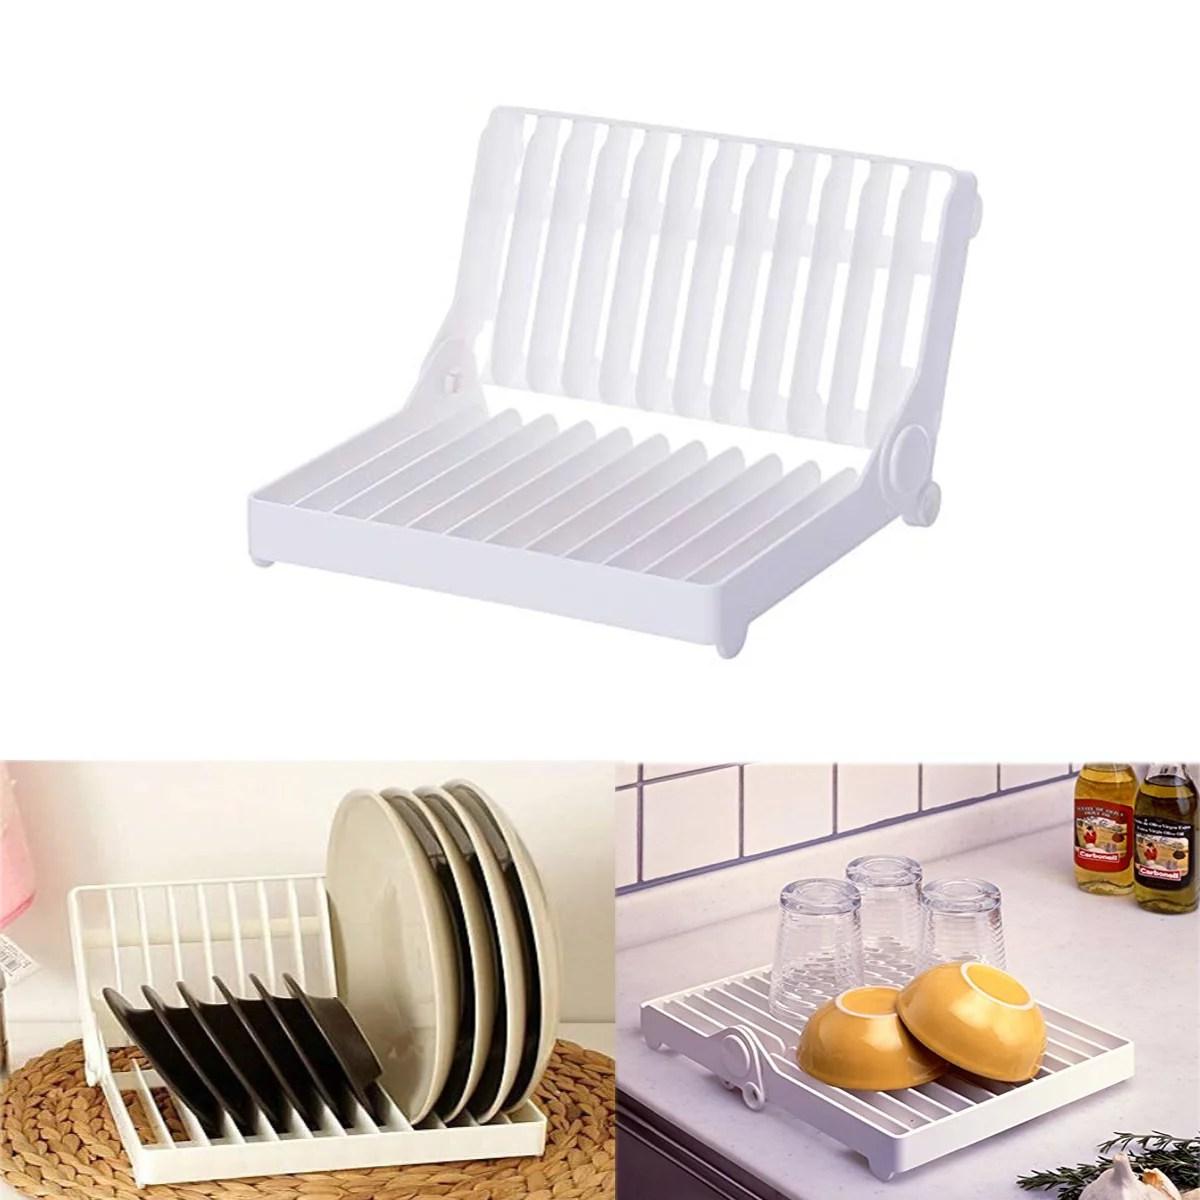 gohope store foldable dish rack stand holder bowl plate organizer tray tableware storage kitchen drying rack dish drainer drip shelf tools white